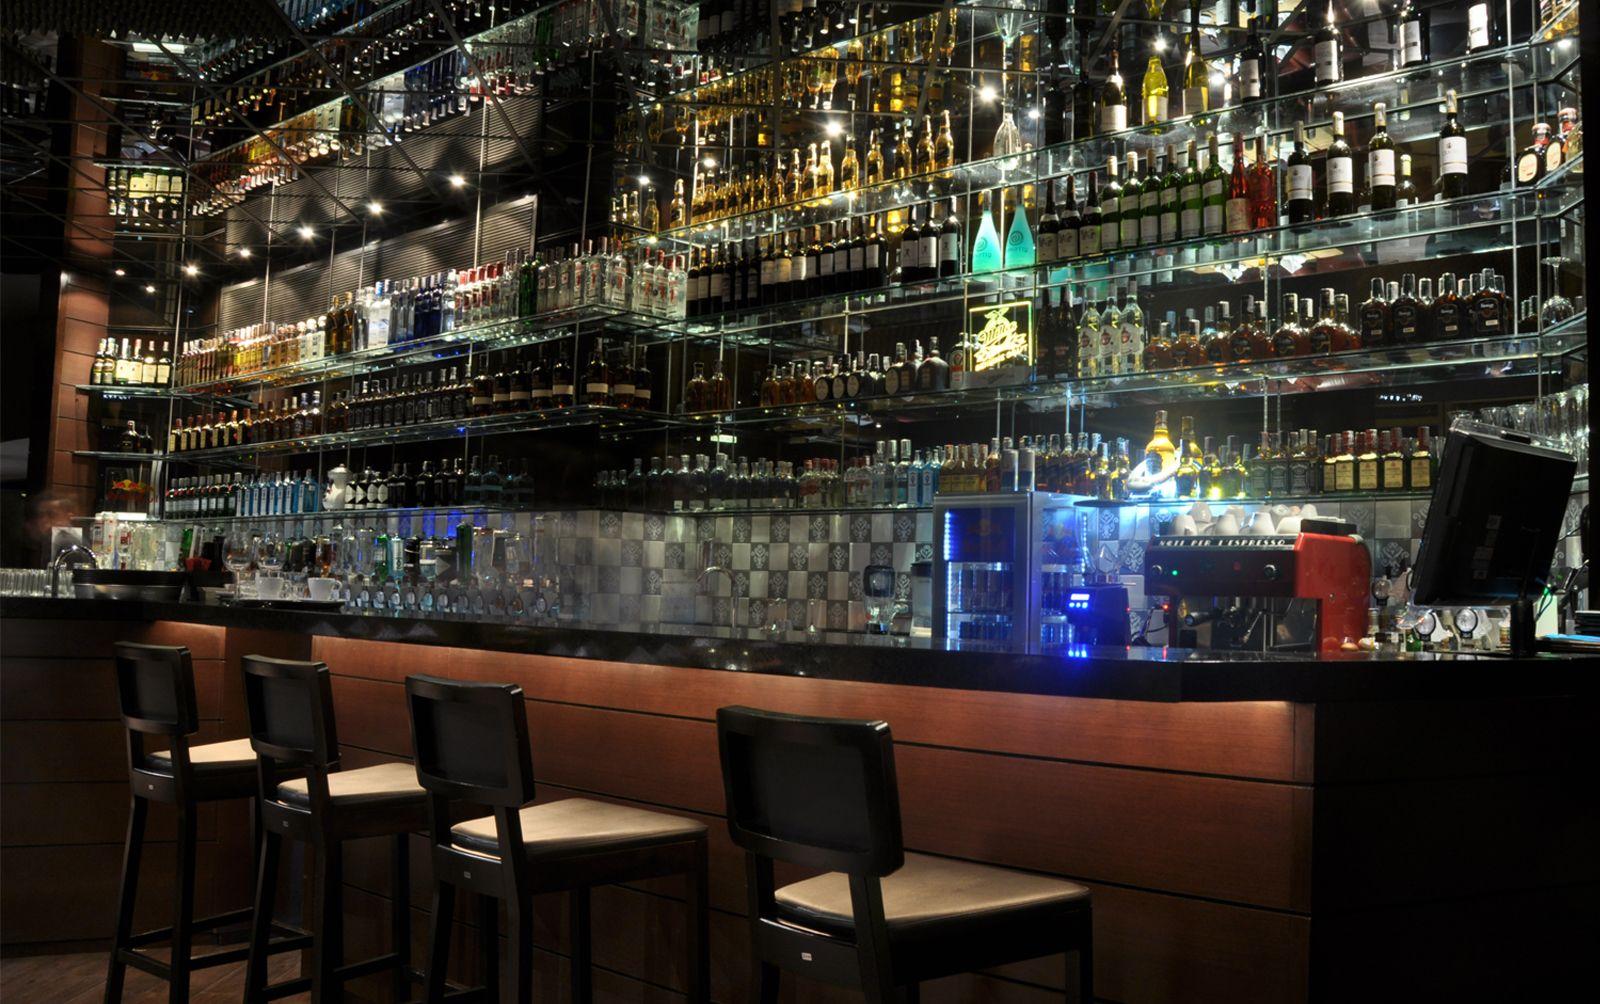 Barra de un bar elegant barra with barra de un bar fabulous led barre lumineuse bar with barra - Decorar un bar de tapas ...